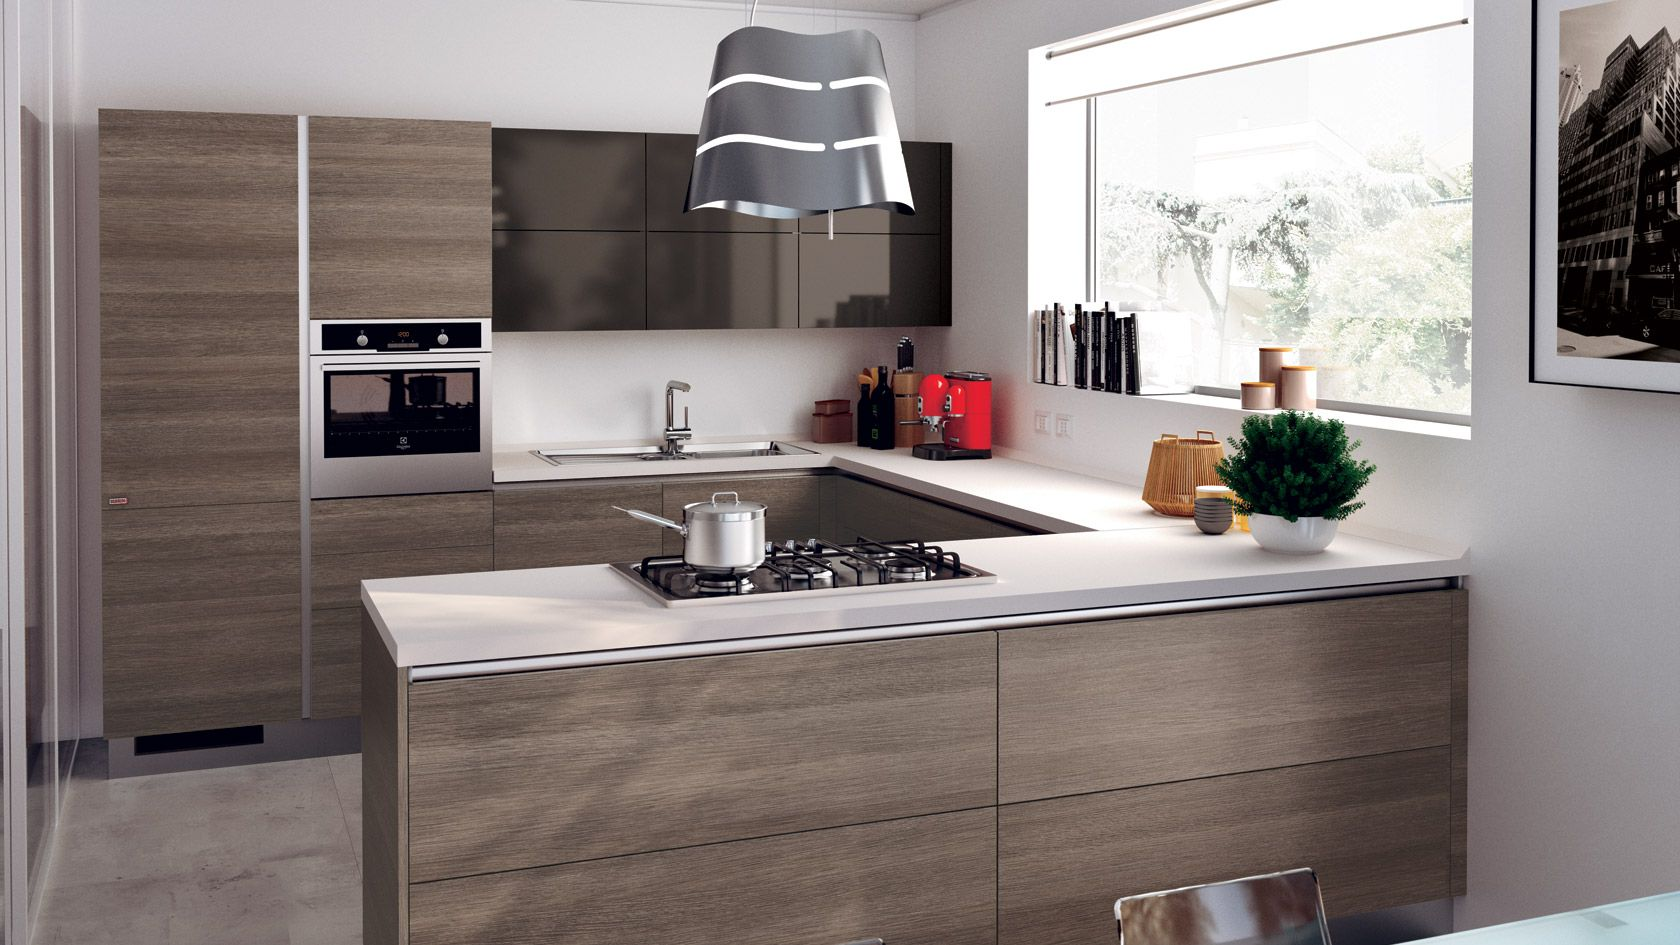 Evoluzione di forme, colori e materiali per una cucina sempre più ...